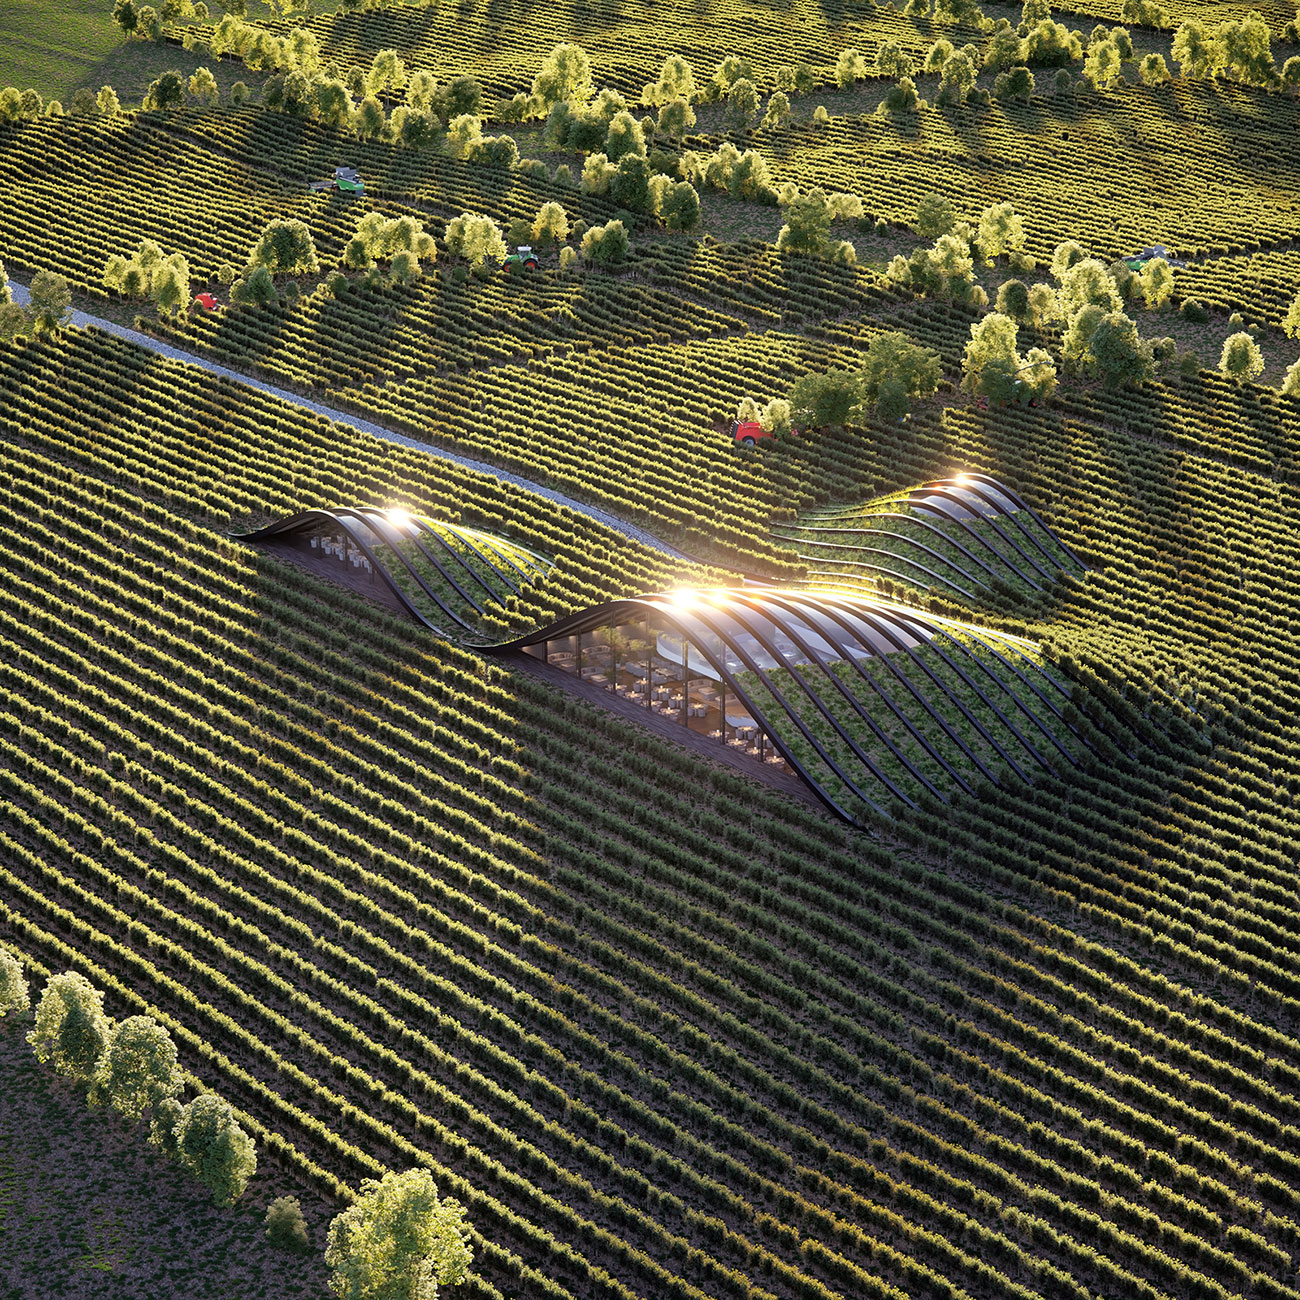 Mixocg vineyard 1 182a5957 d6lh